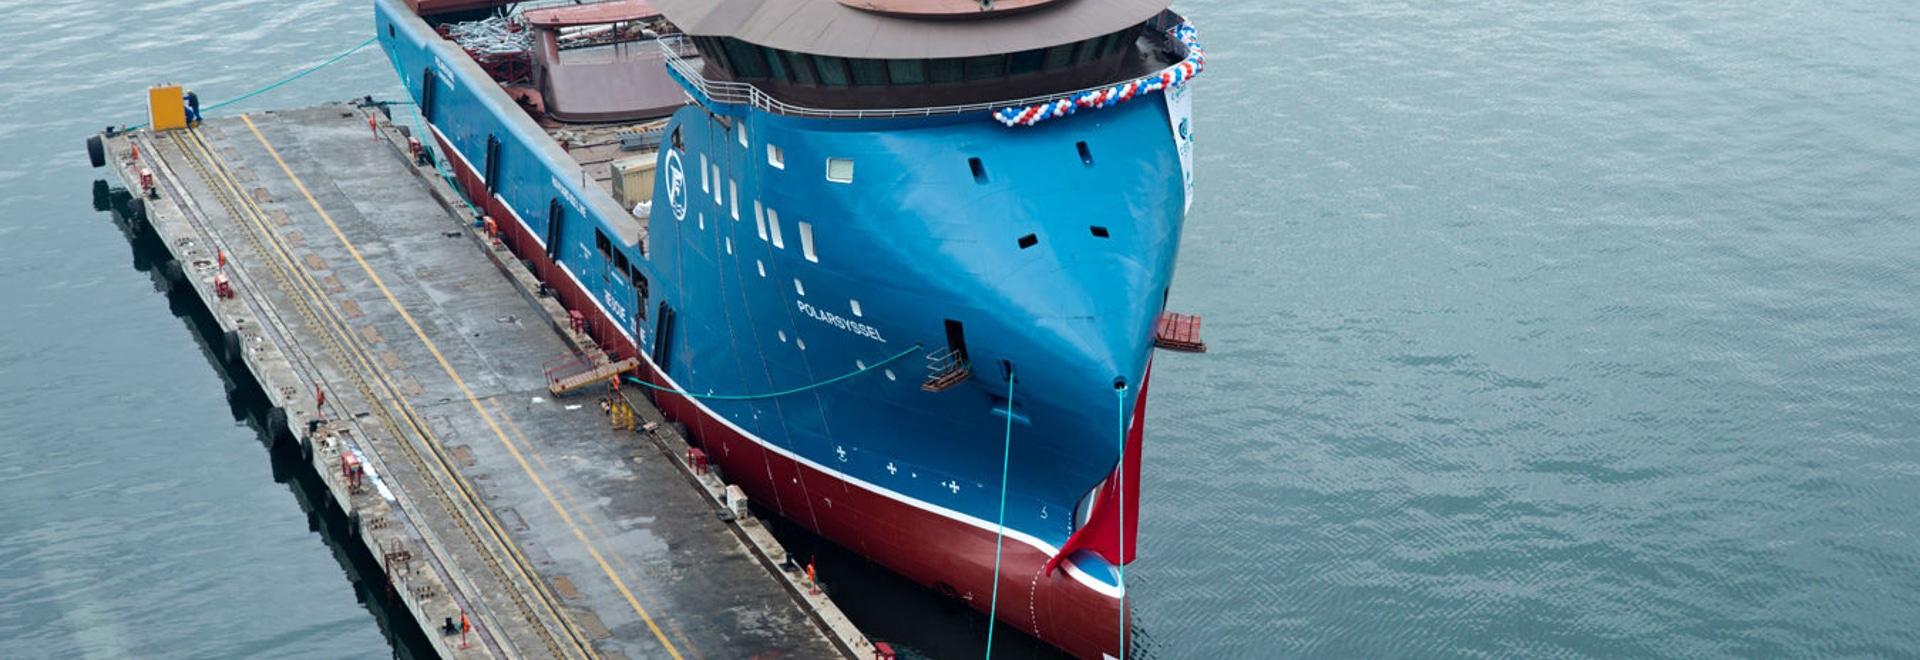 NEW: platform supply vessels PSV offshore support vessel by Cemre Shipyard